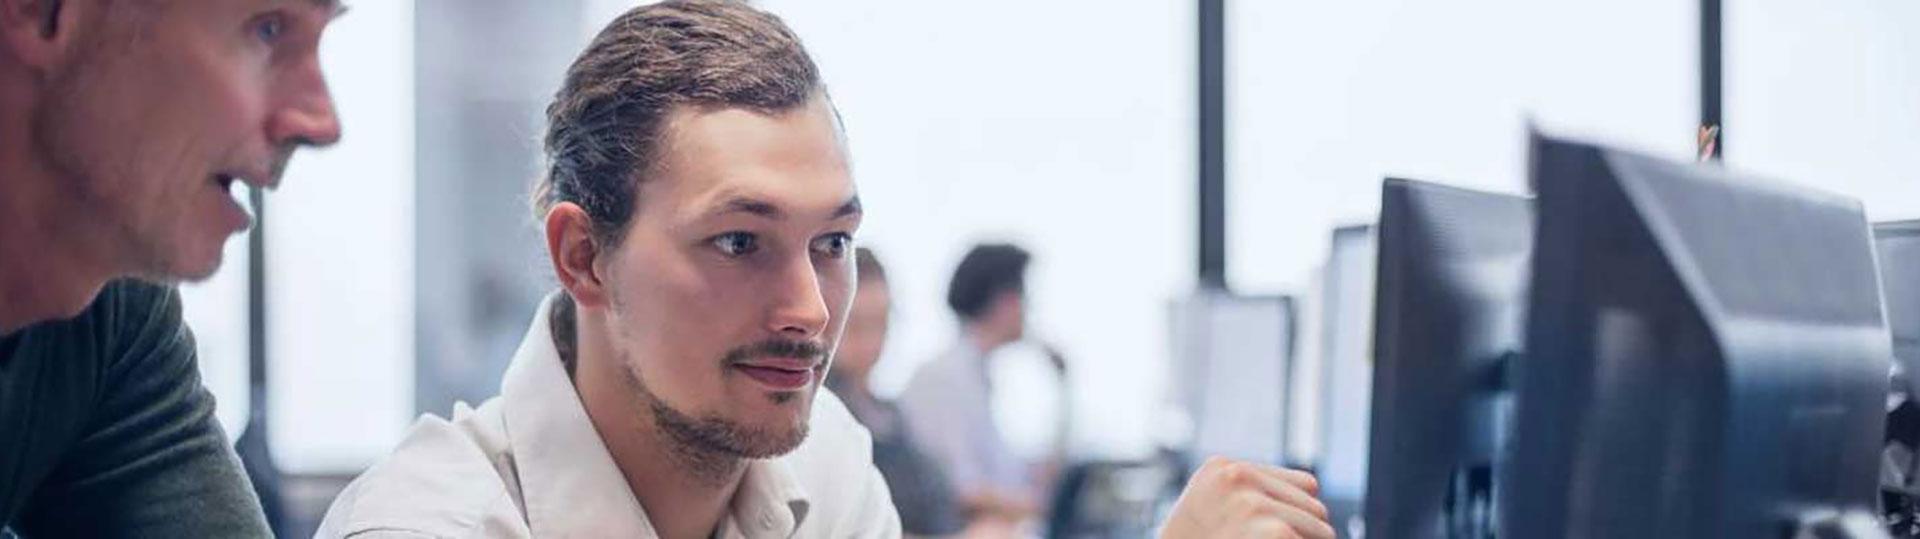 Cloud Summit Spotlight: Richard Dufty on How Partners Can Start Monetizing XaaS